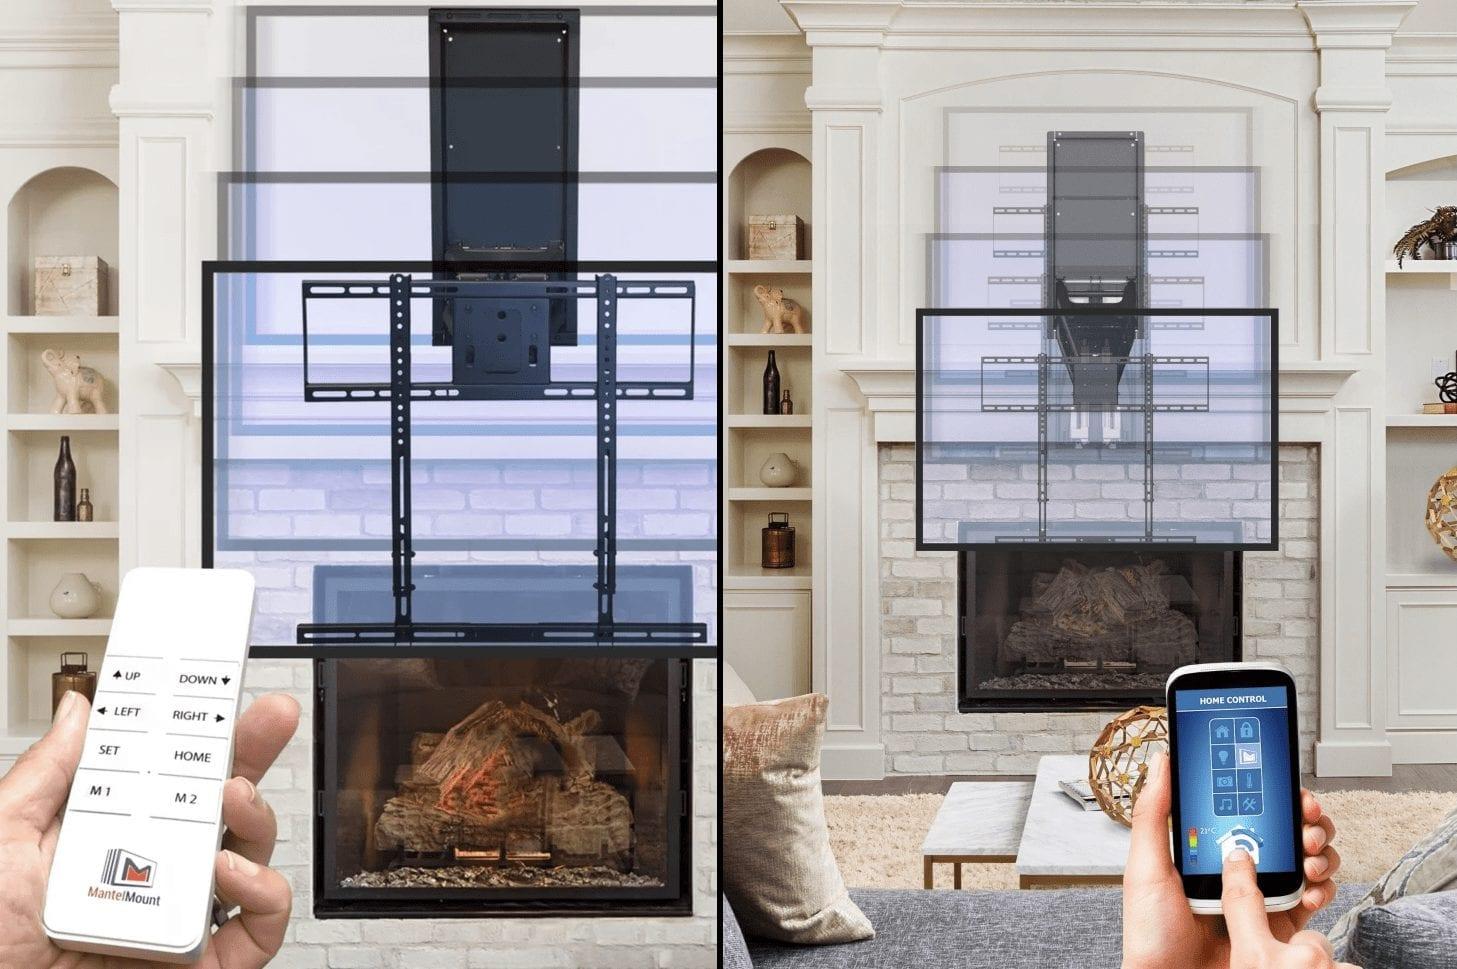 MantelMount 860 motorized TV mount